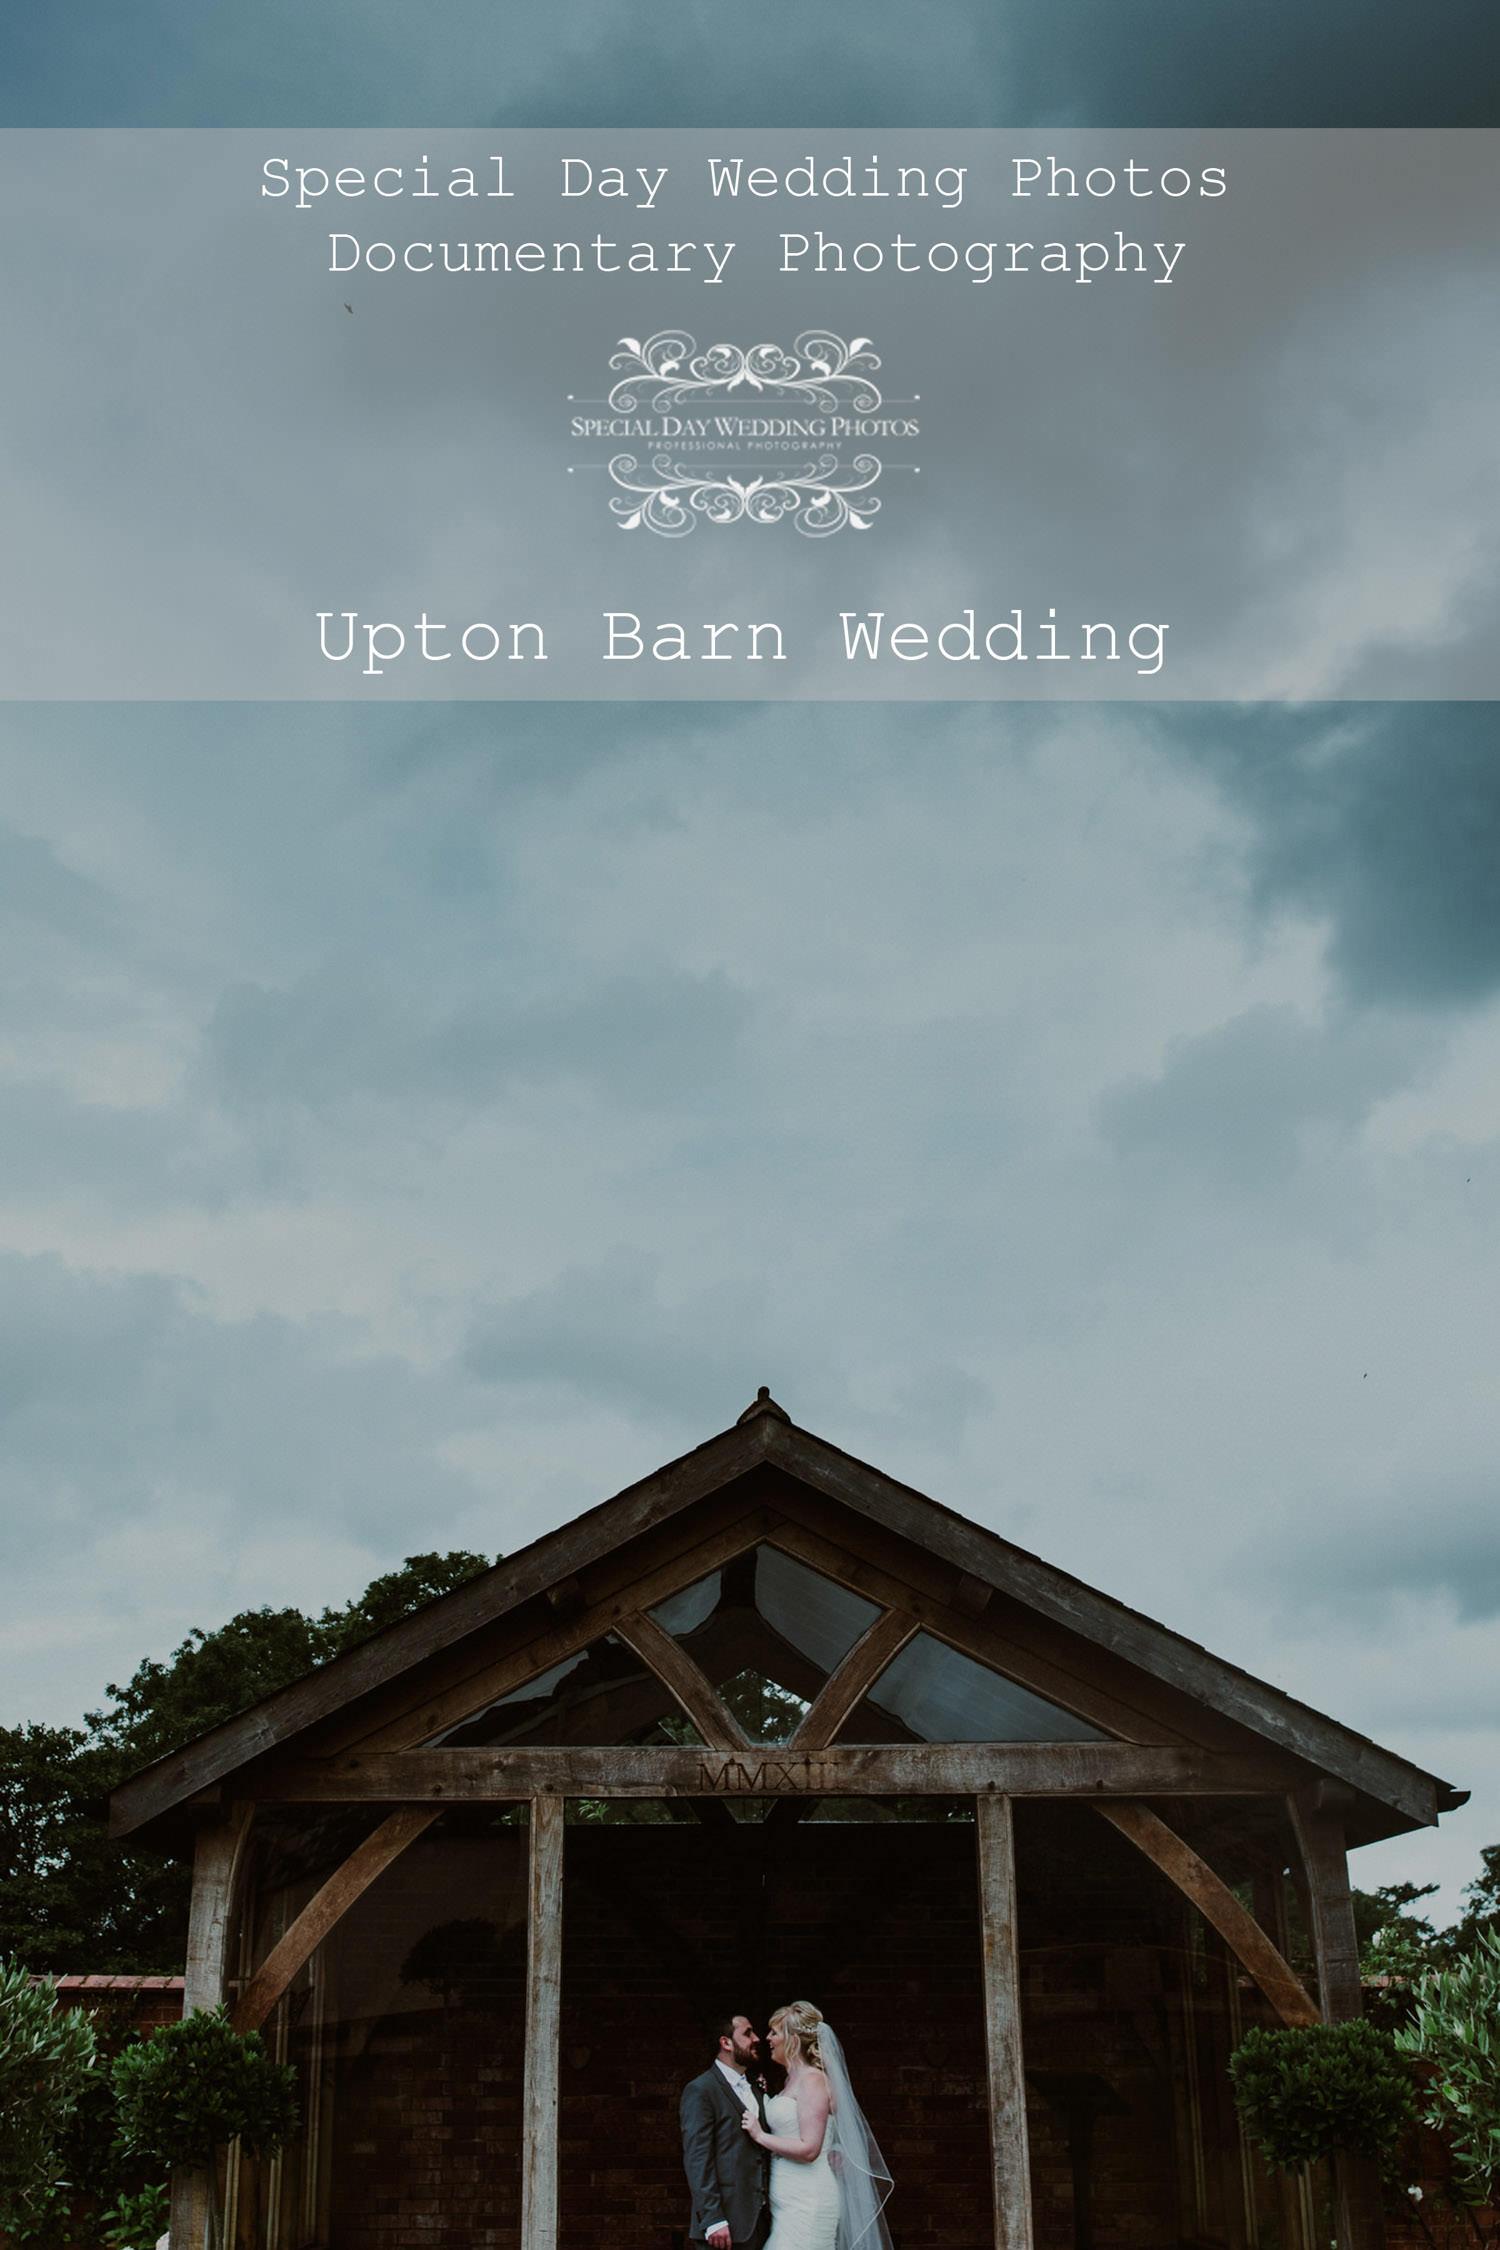 upton barn wedding devon photographer, upton barn wedding photographer